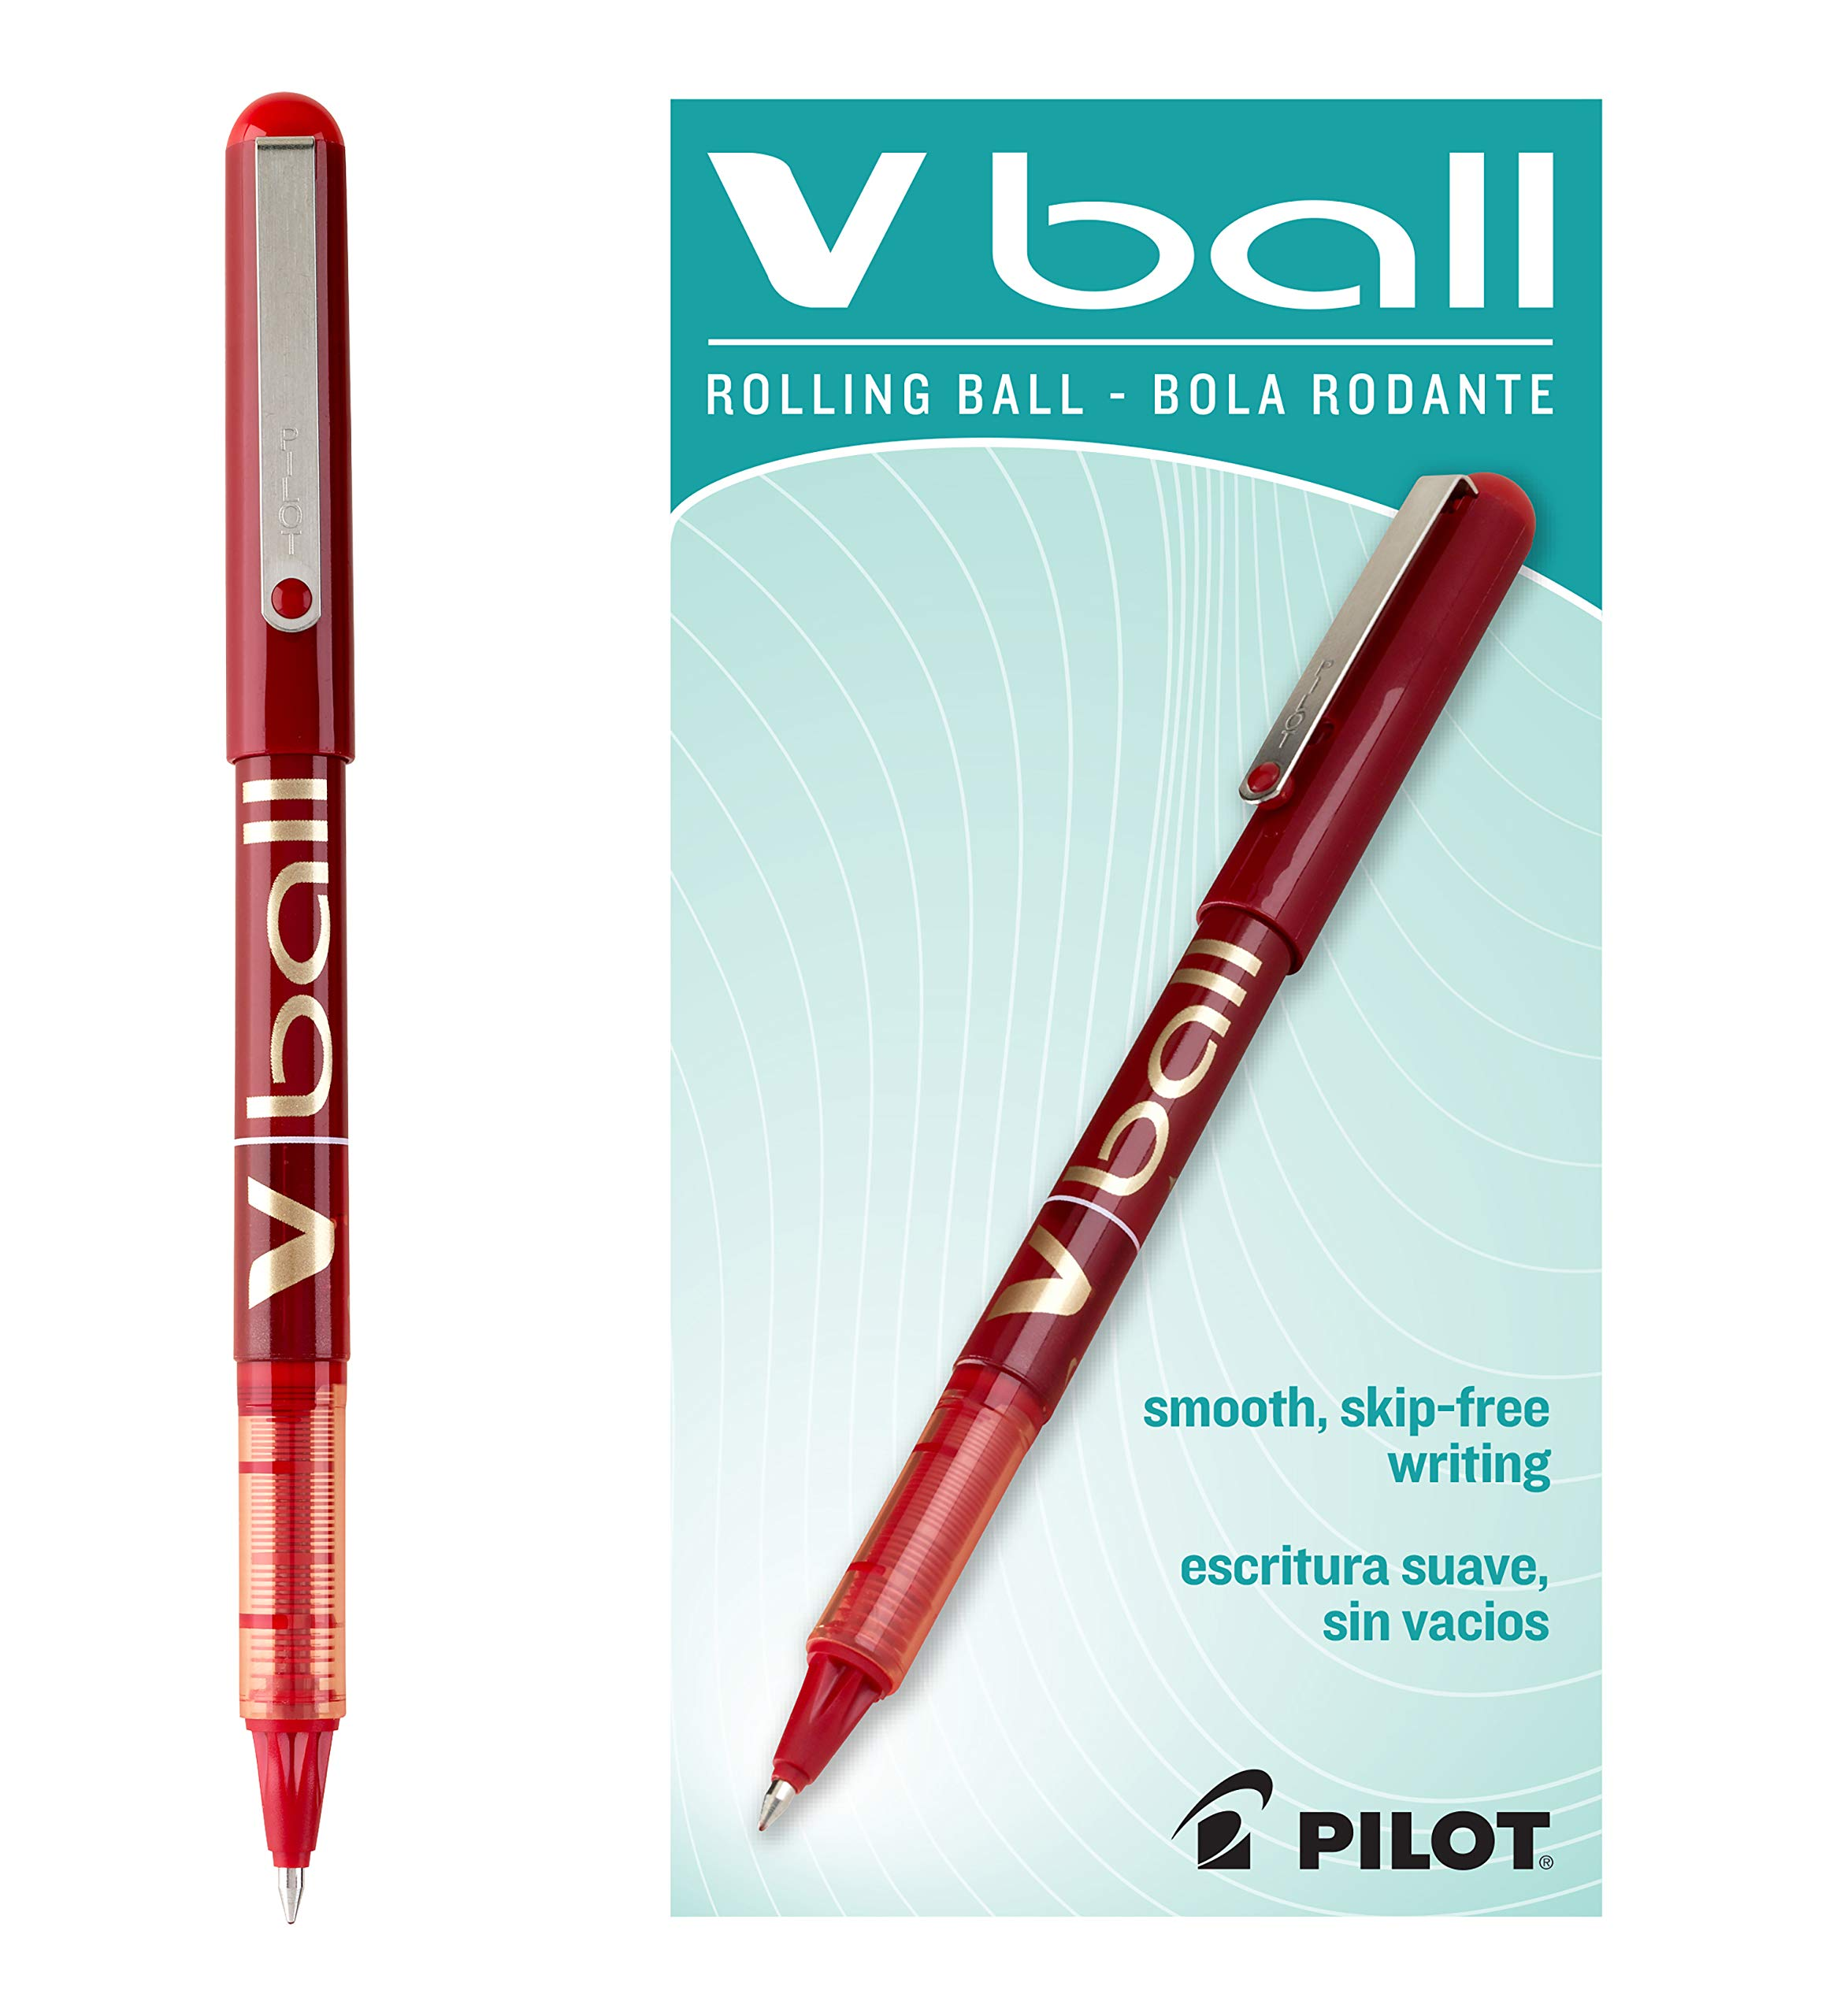 Pilot VBall Liquid Ink Roller Ball Stick Pen tinta roja 7 mm